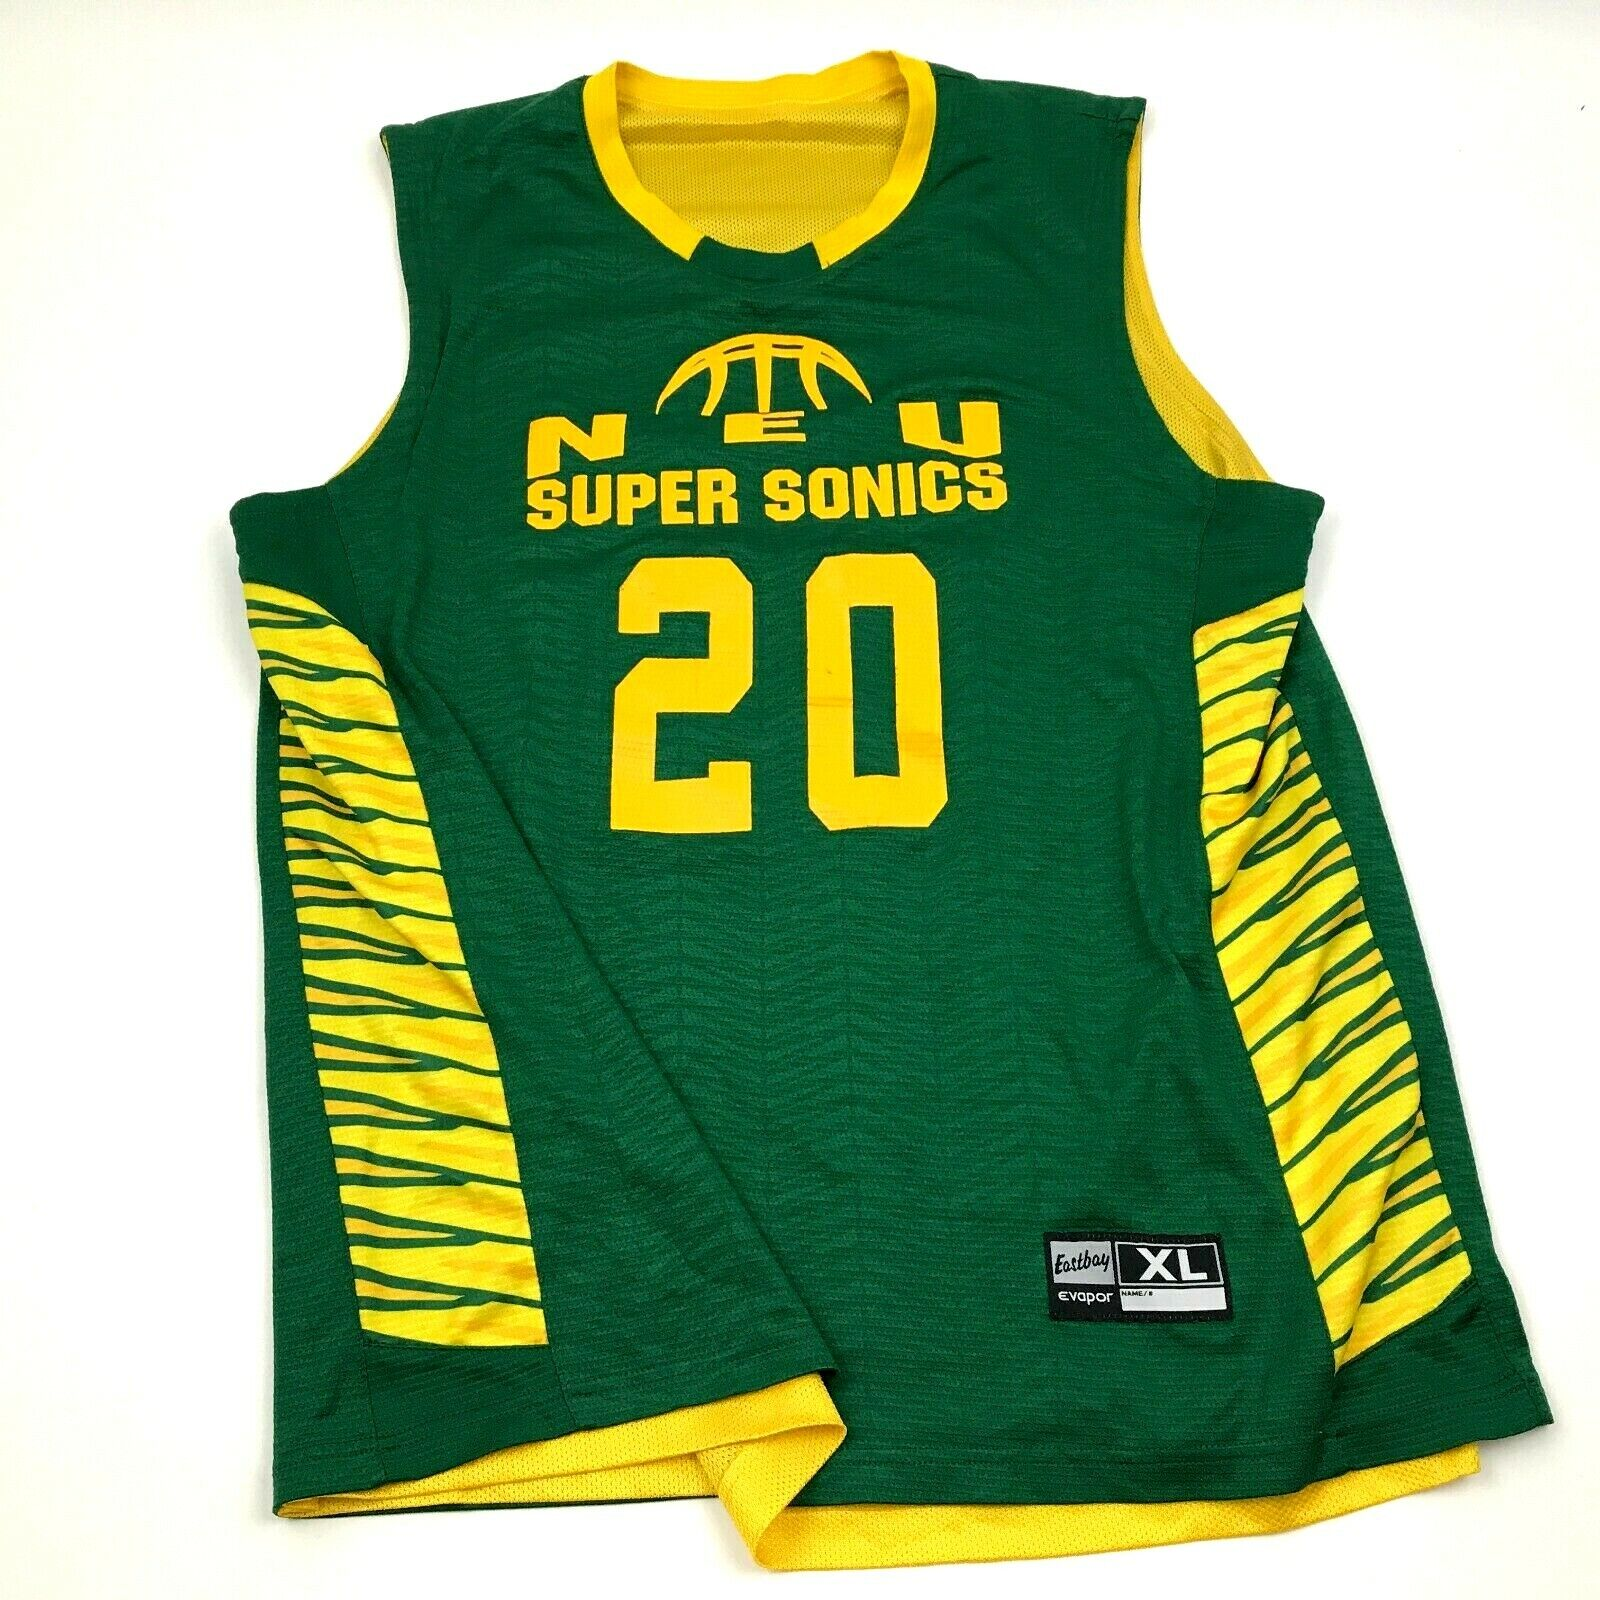 NEU Super Sonics Basketball Jersey Size Extra Large XL Green Yellow Shirt Tank